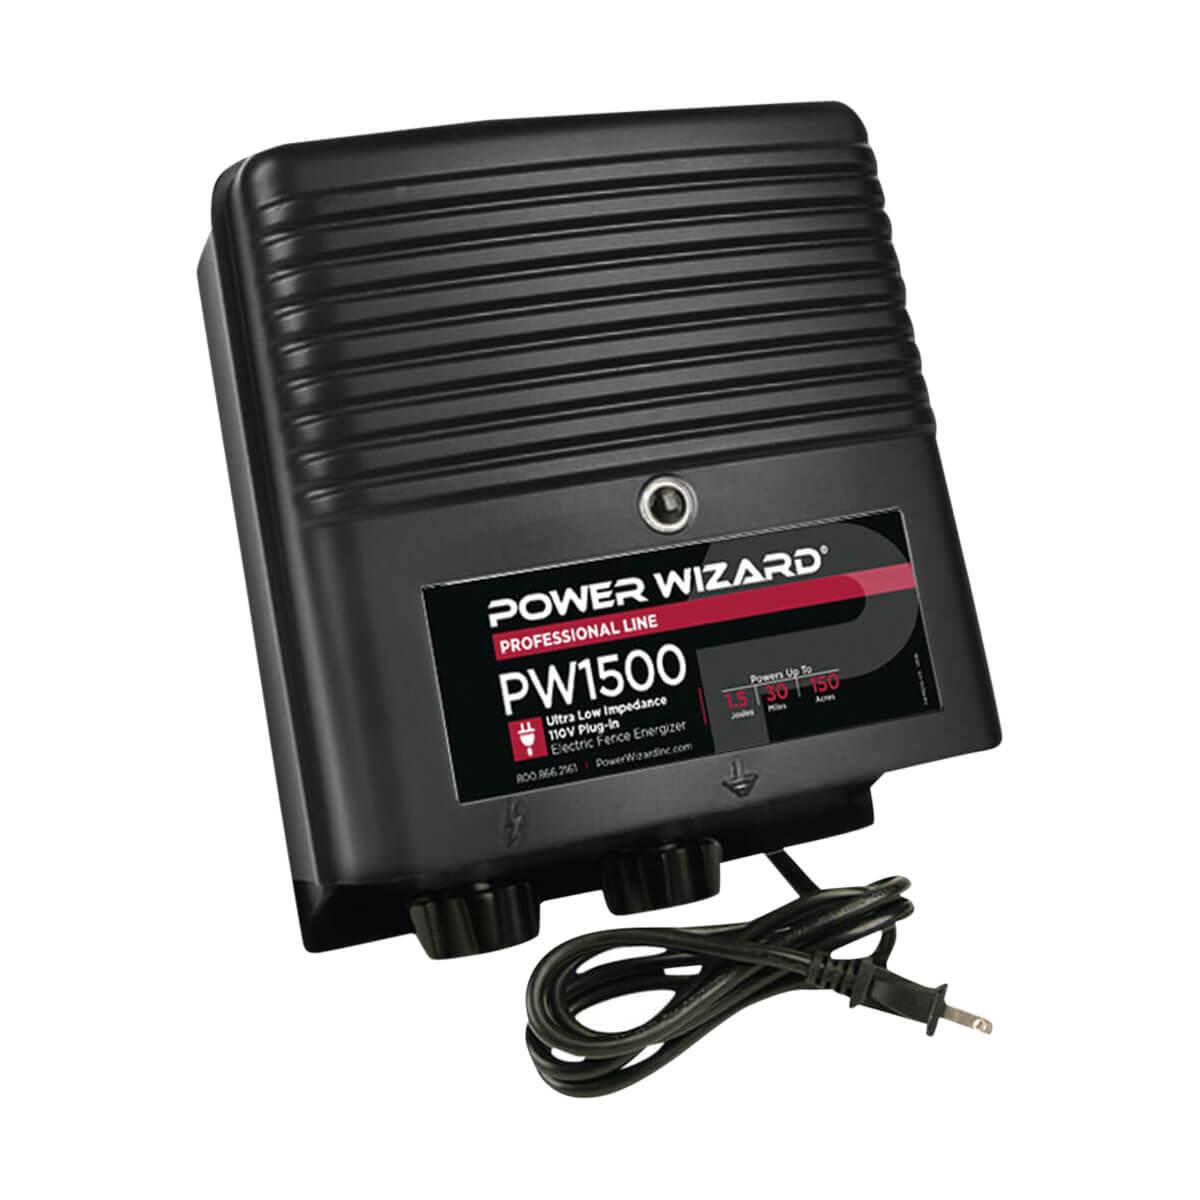 Power Wizard PW1500 Energizer